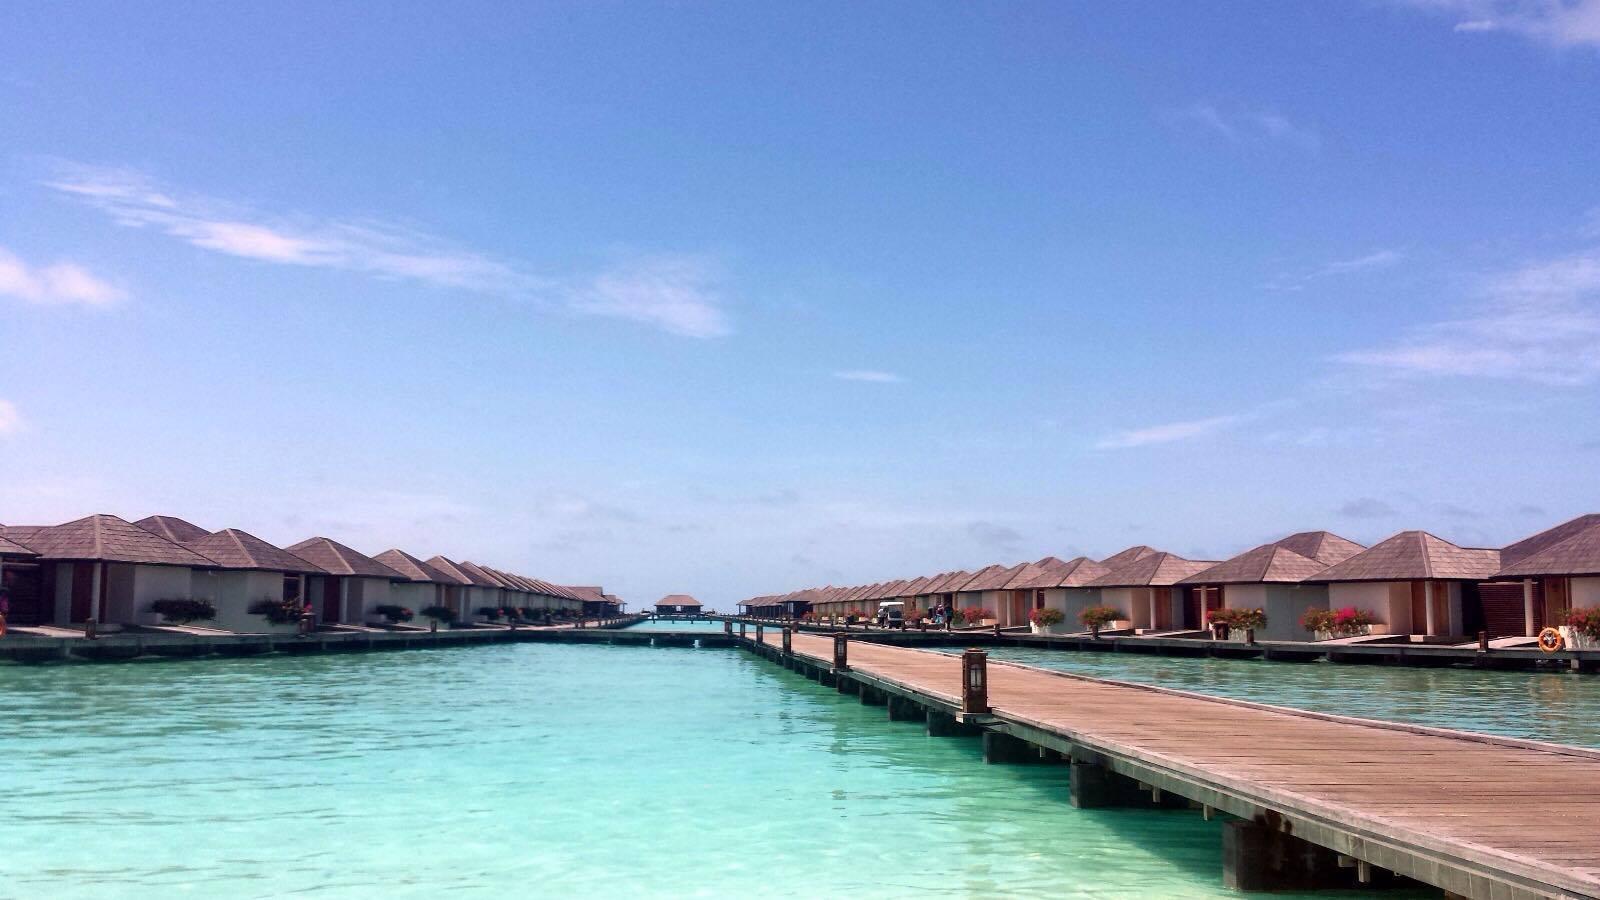 "<img src=""Resort.jpg"" alt=""Resort di lusso alle Maldive"">"